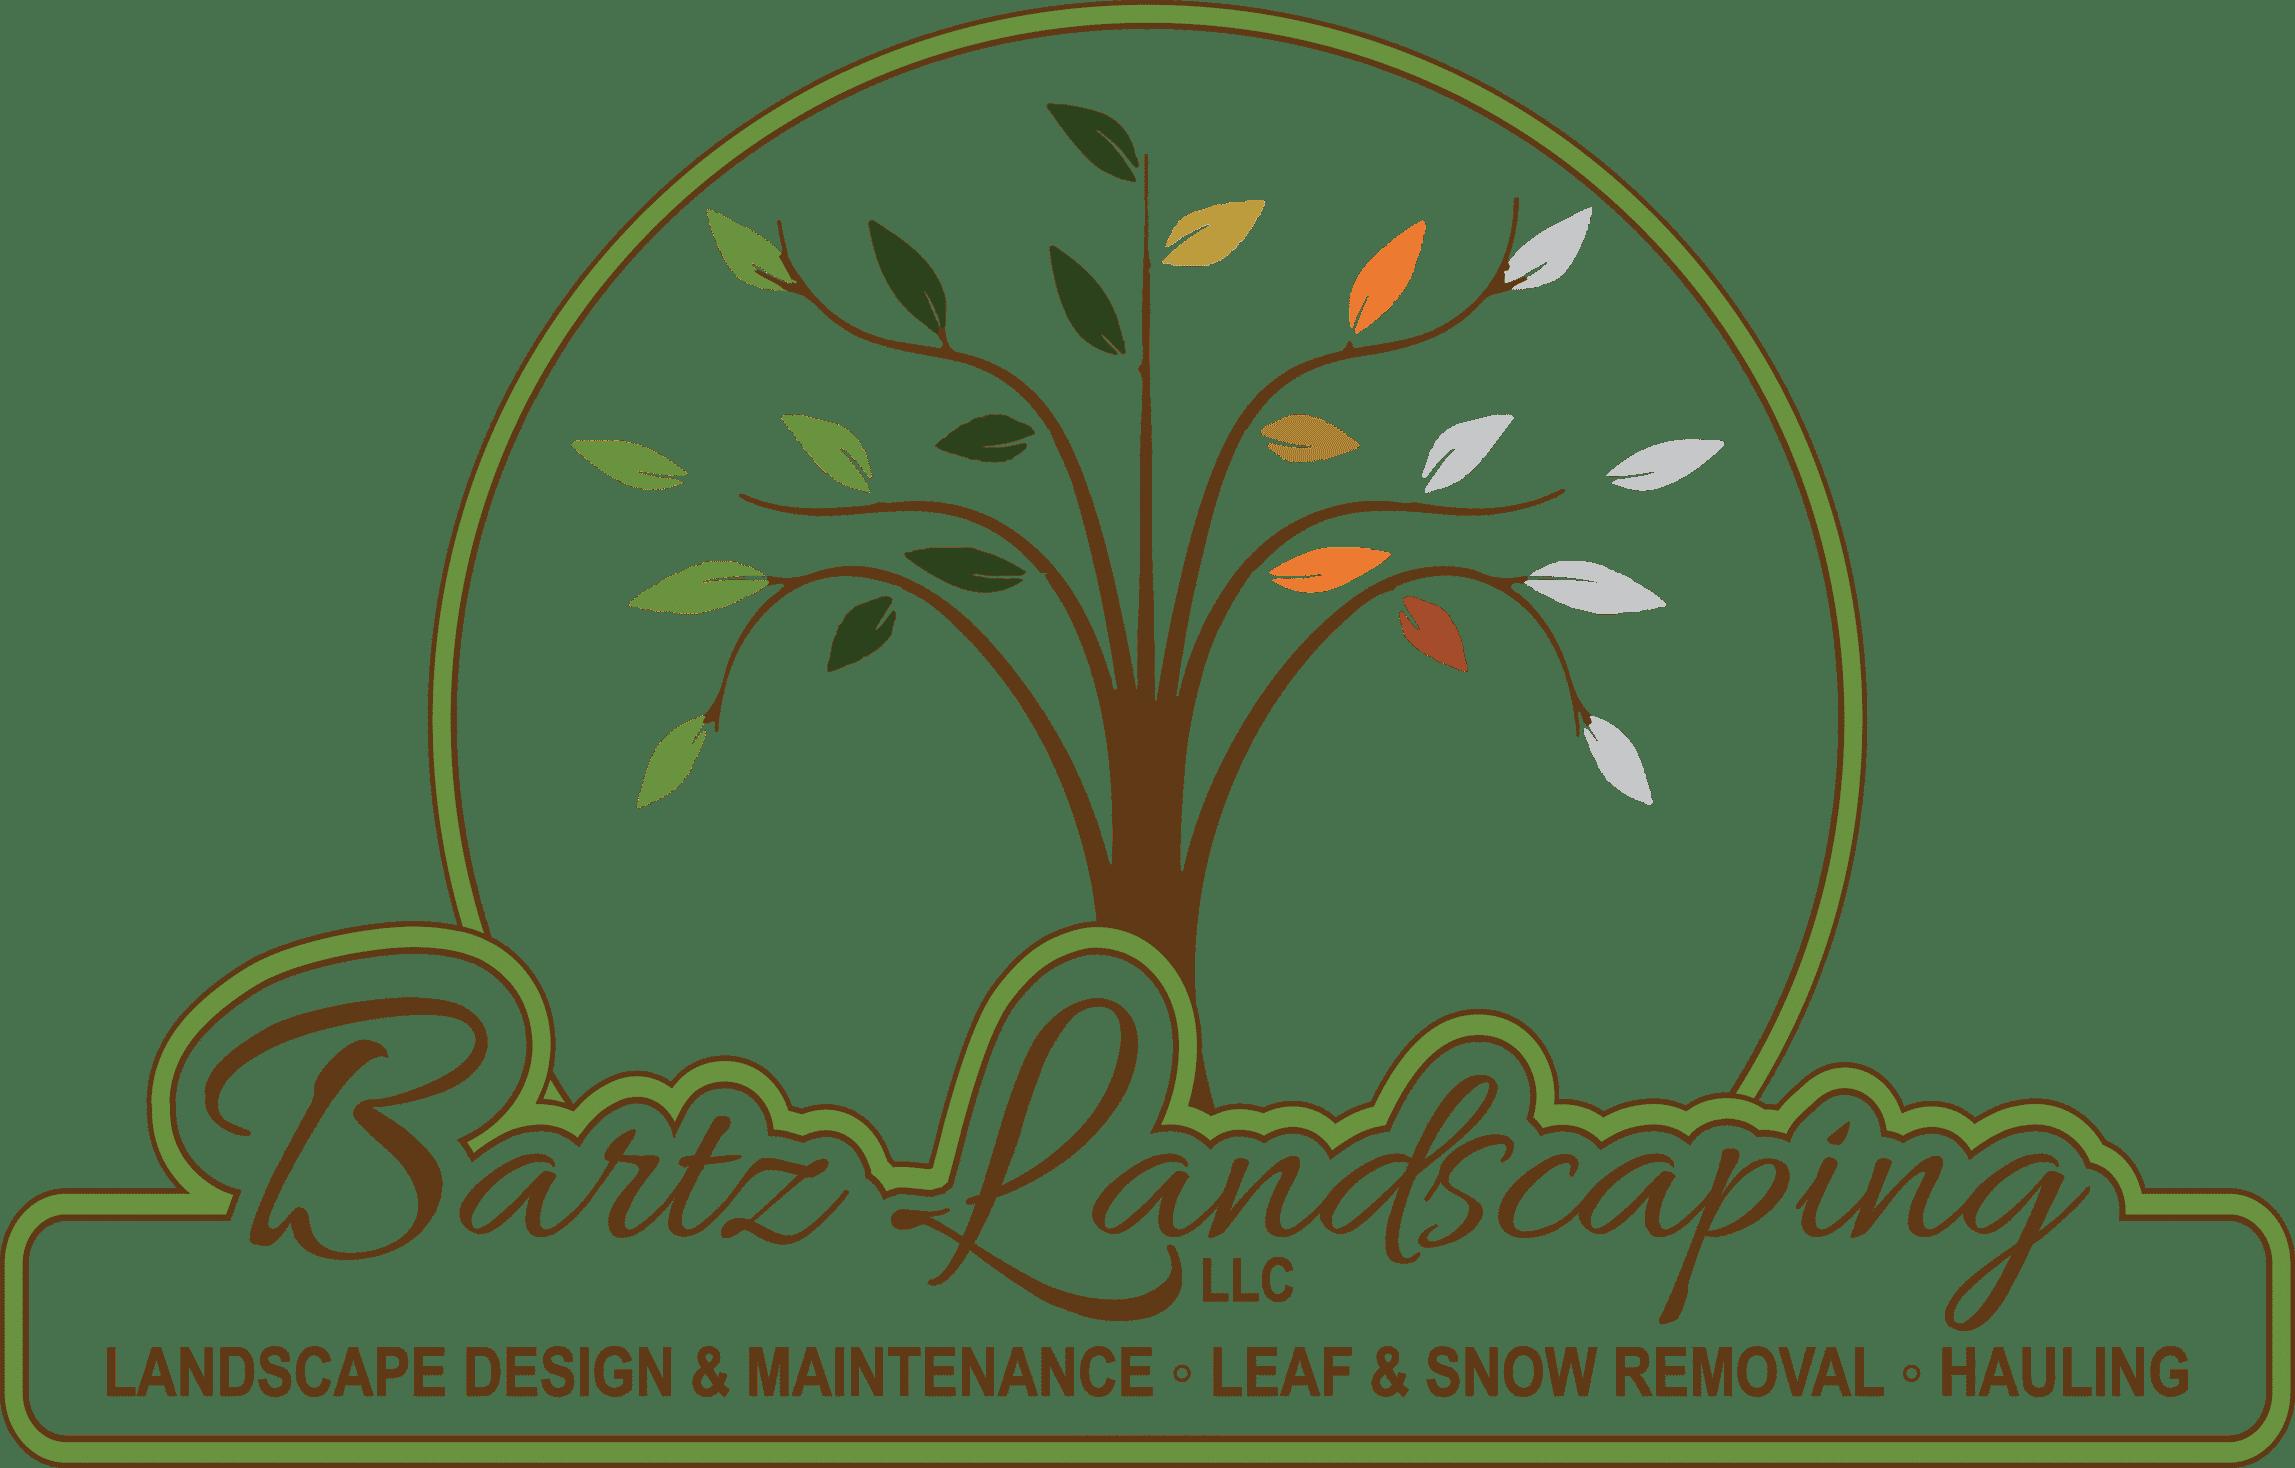 Bartz Landscaping